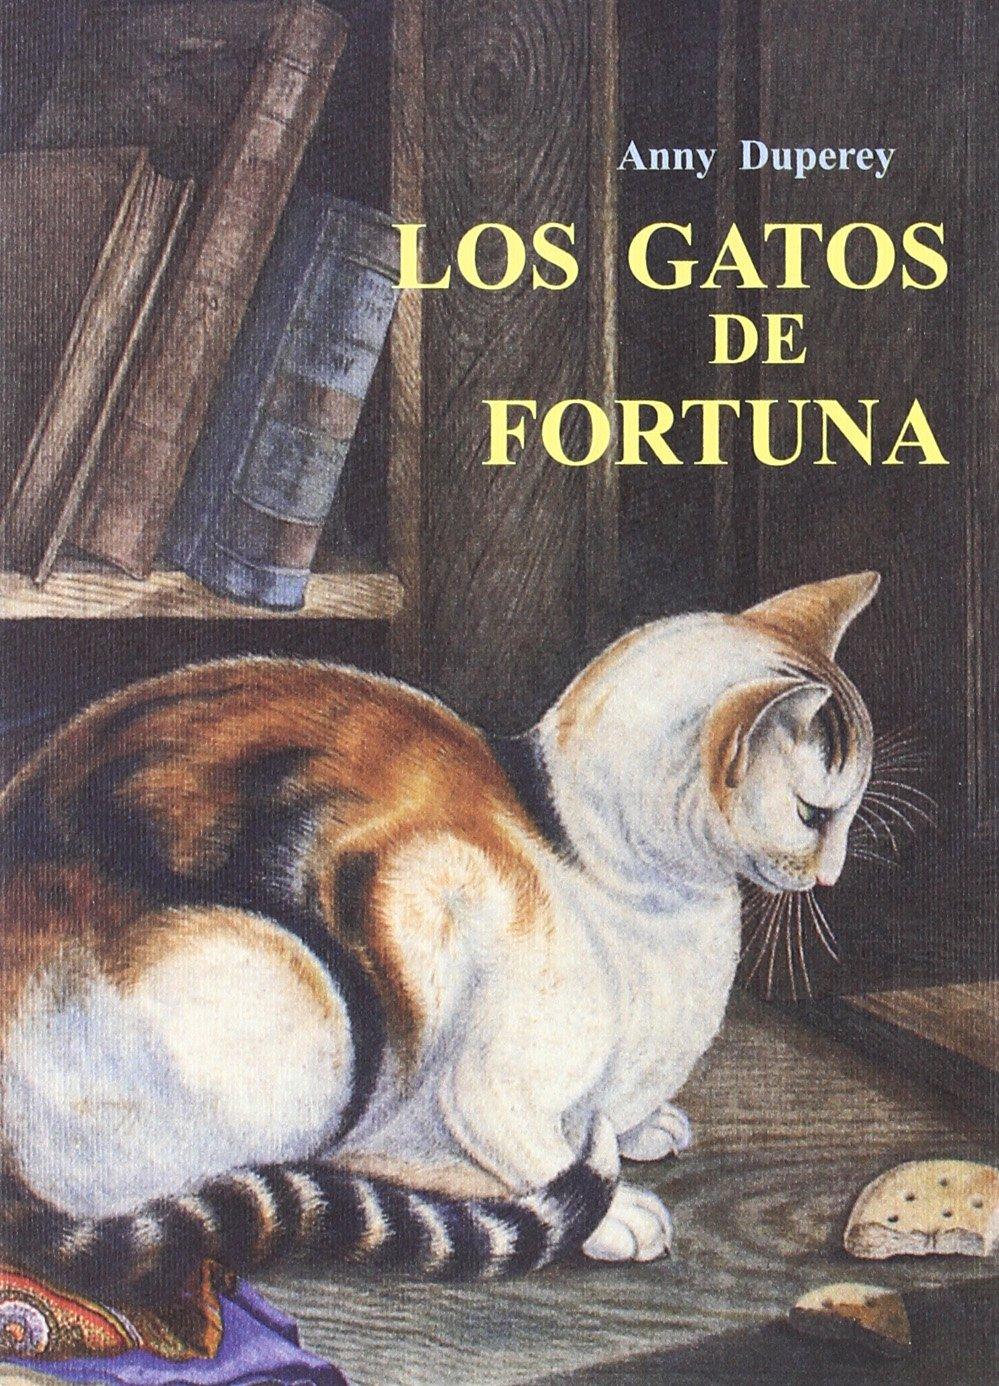 Los gatos de Fortuna (Spanish) Paperback – 2000